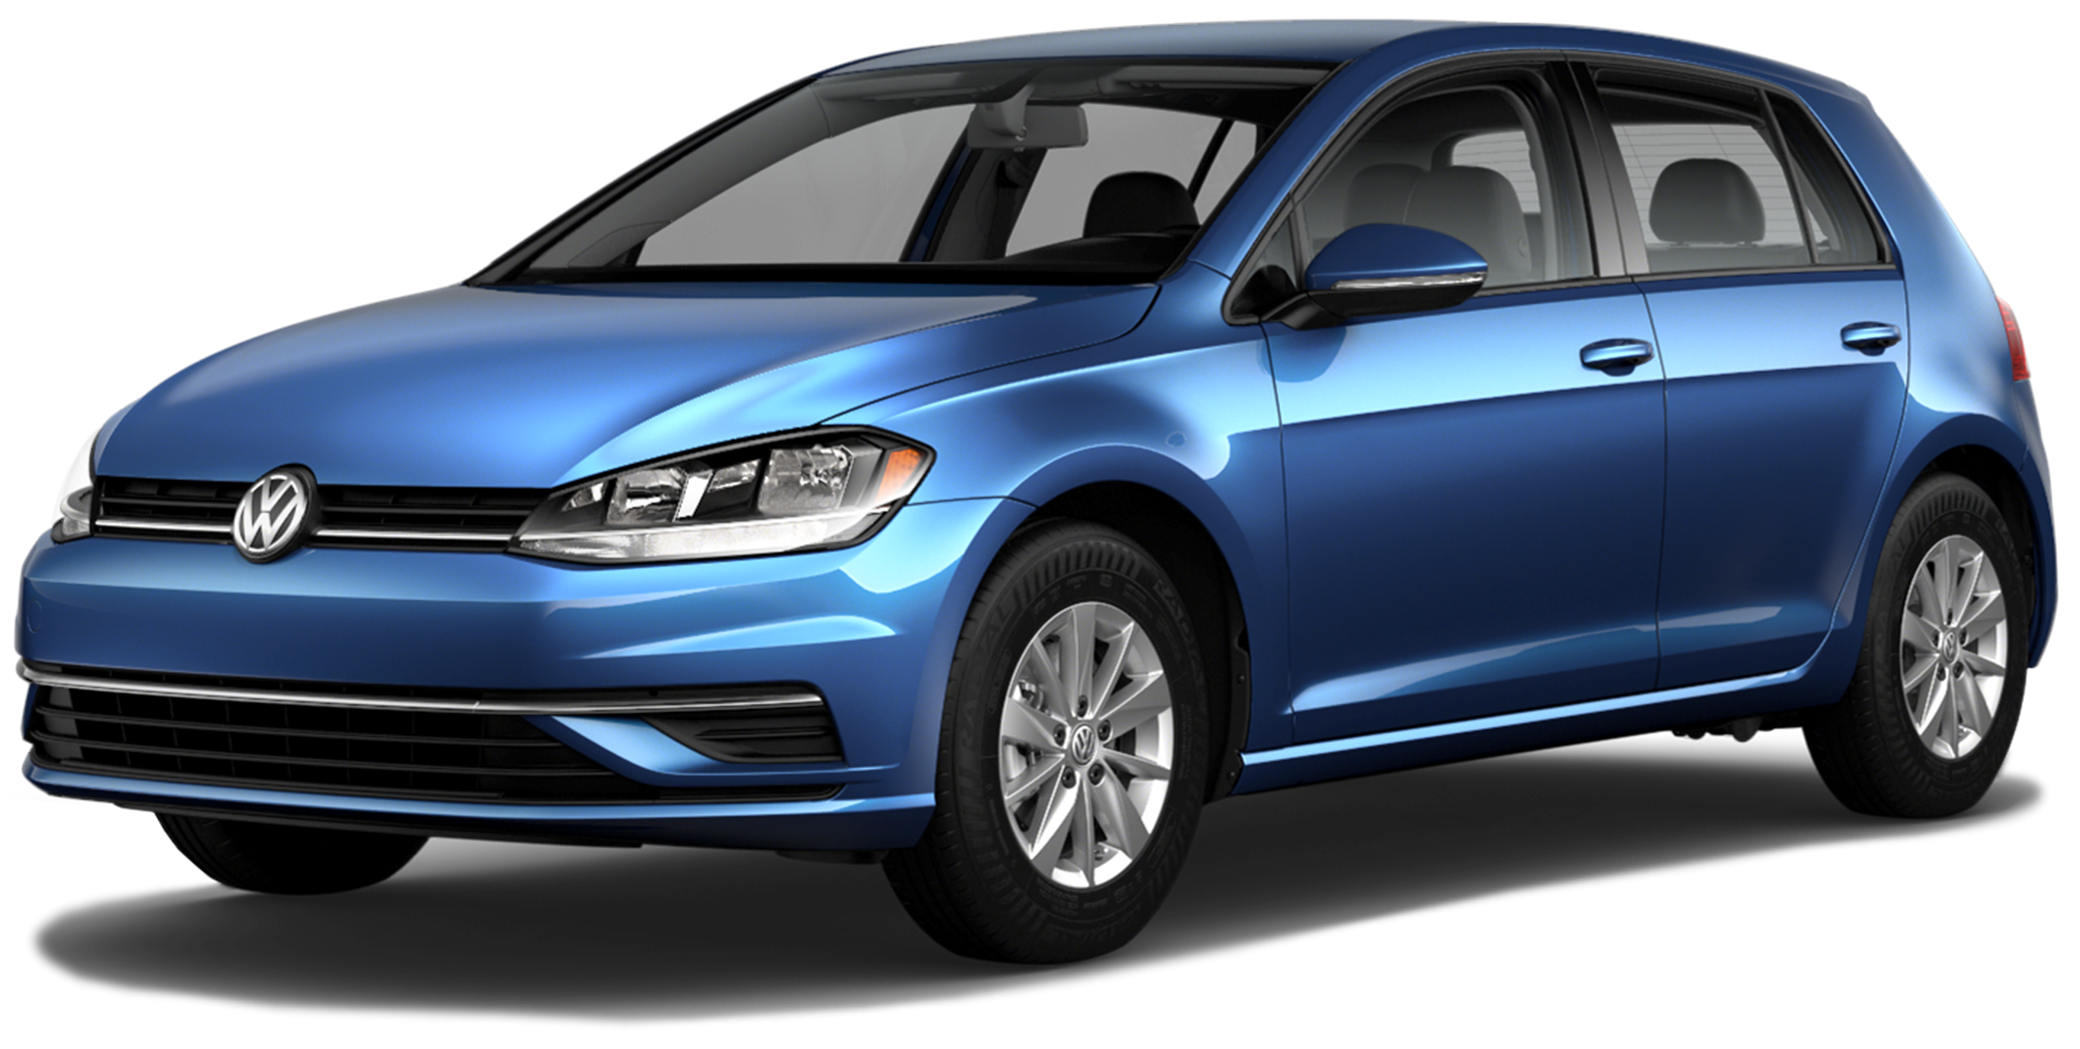 2019 Volkswagen Golf Incentives, Specials & Offers in Austin TX